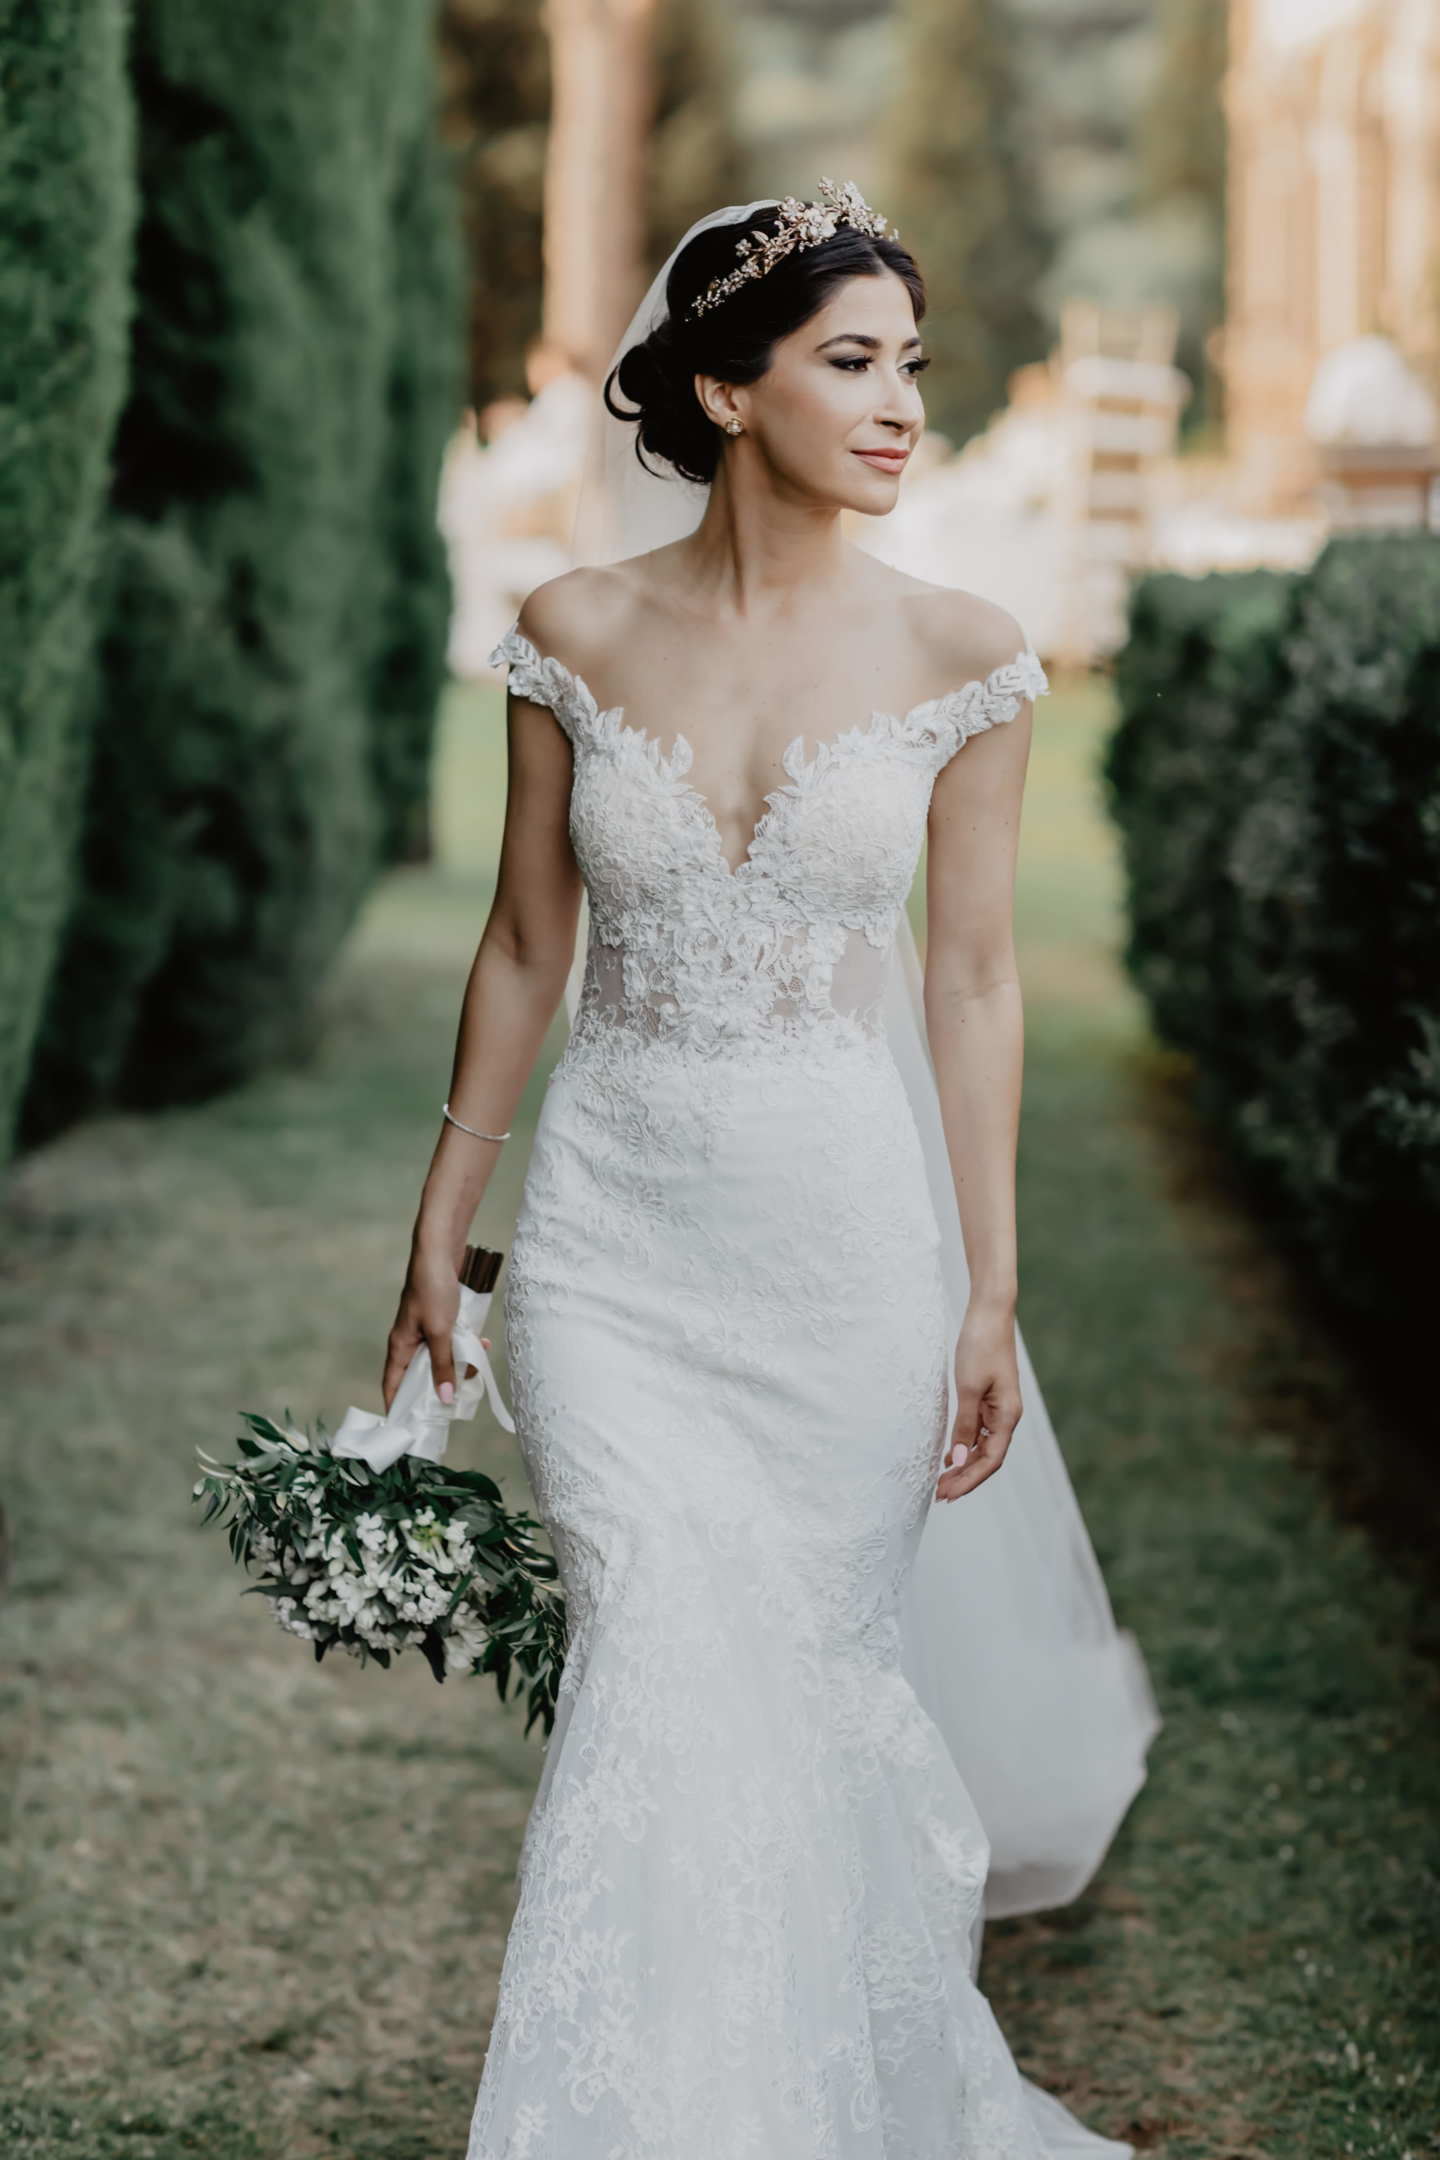 Bride portrait: when beauty comes from happiness - 16 :: Bride's portrait: when beauty comes from happiness :: Luxury wedding photography - 15 :: Bride portrait: when beauty comes from happiness - 16